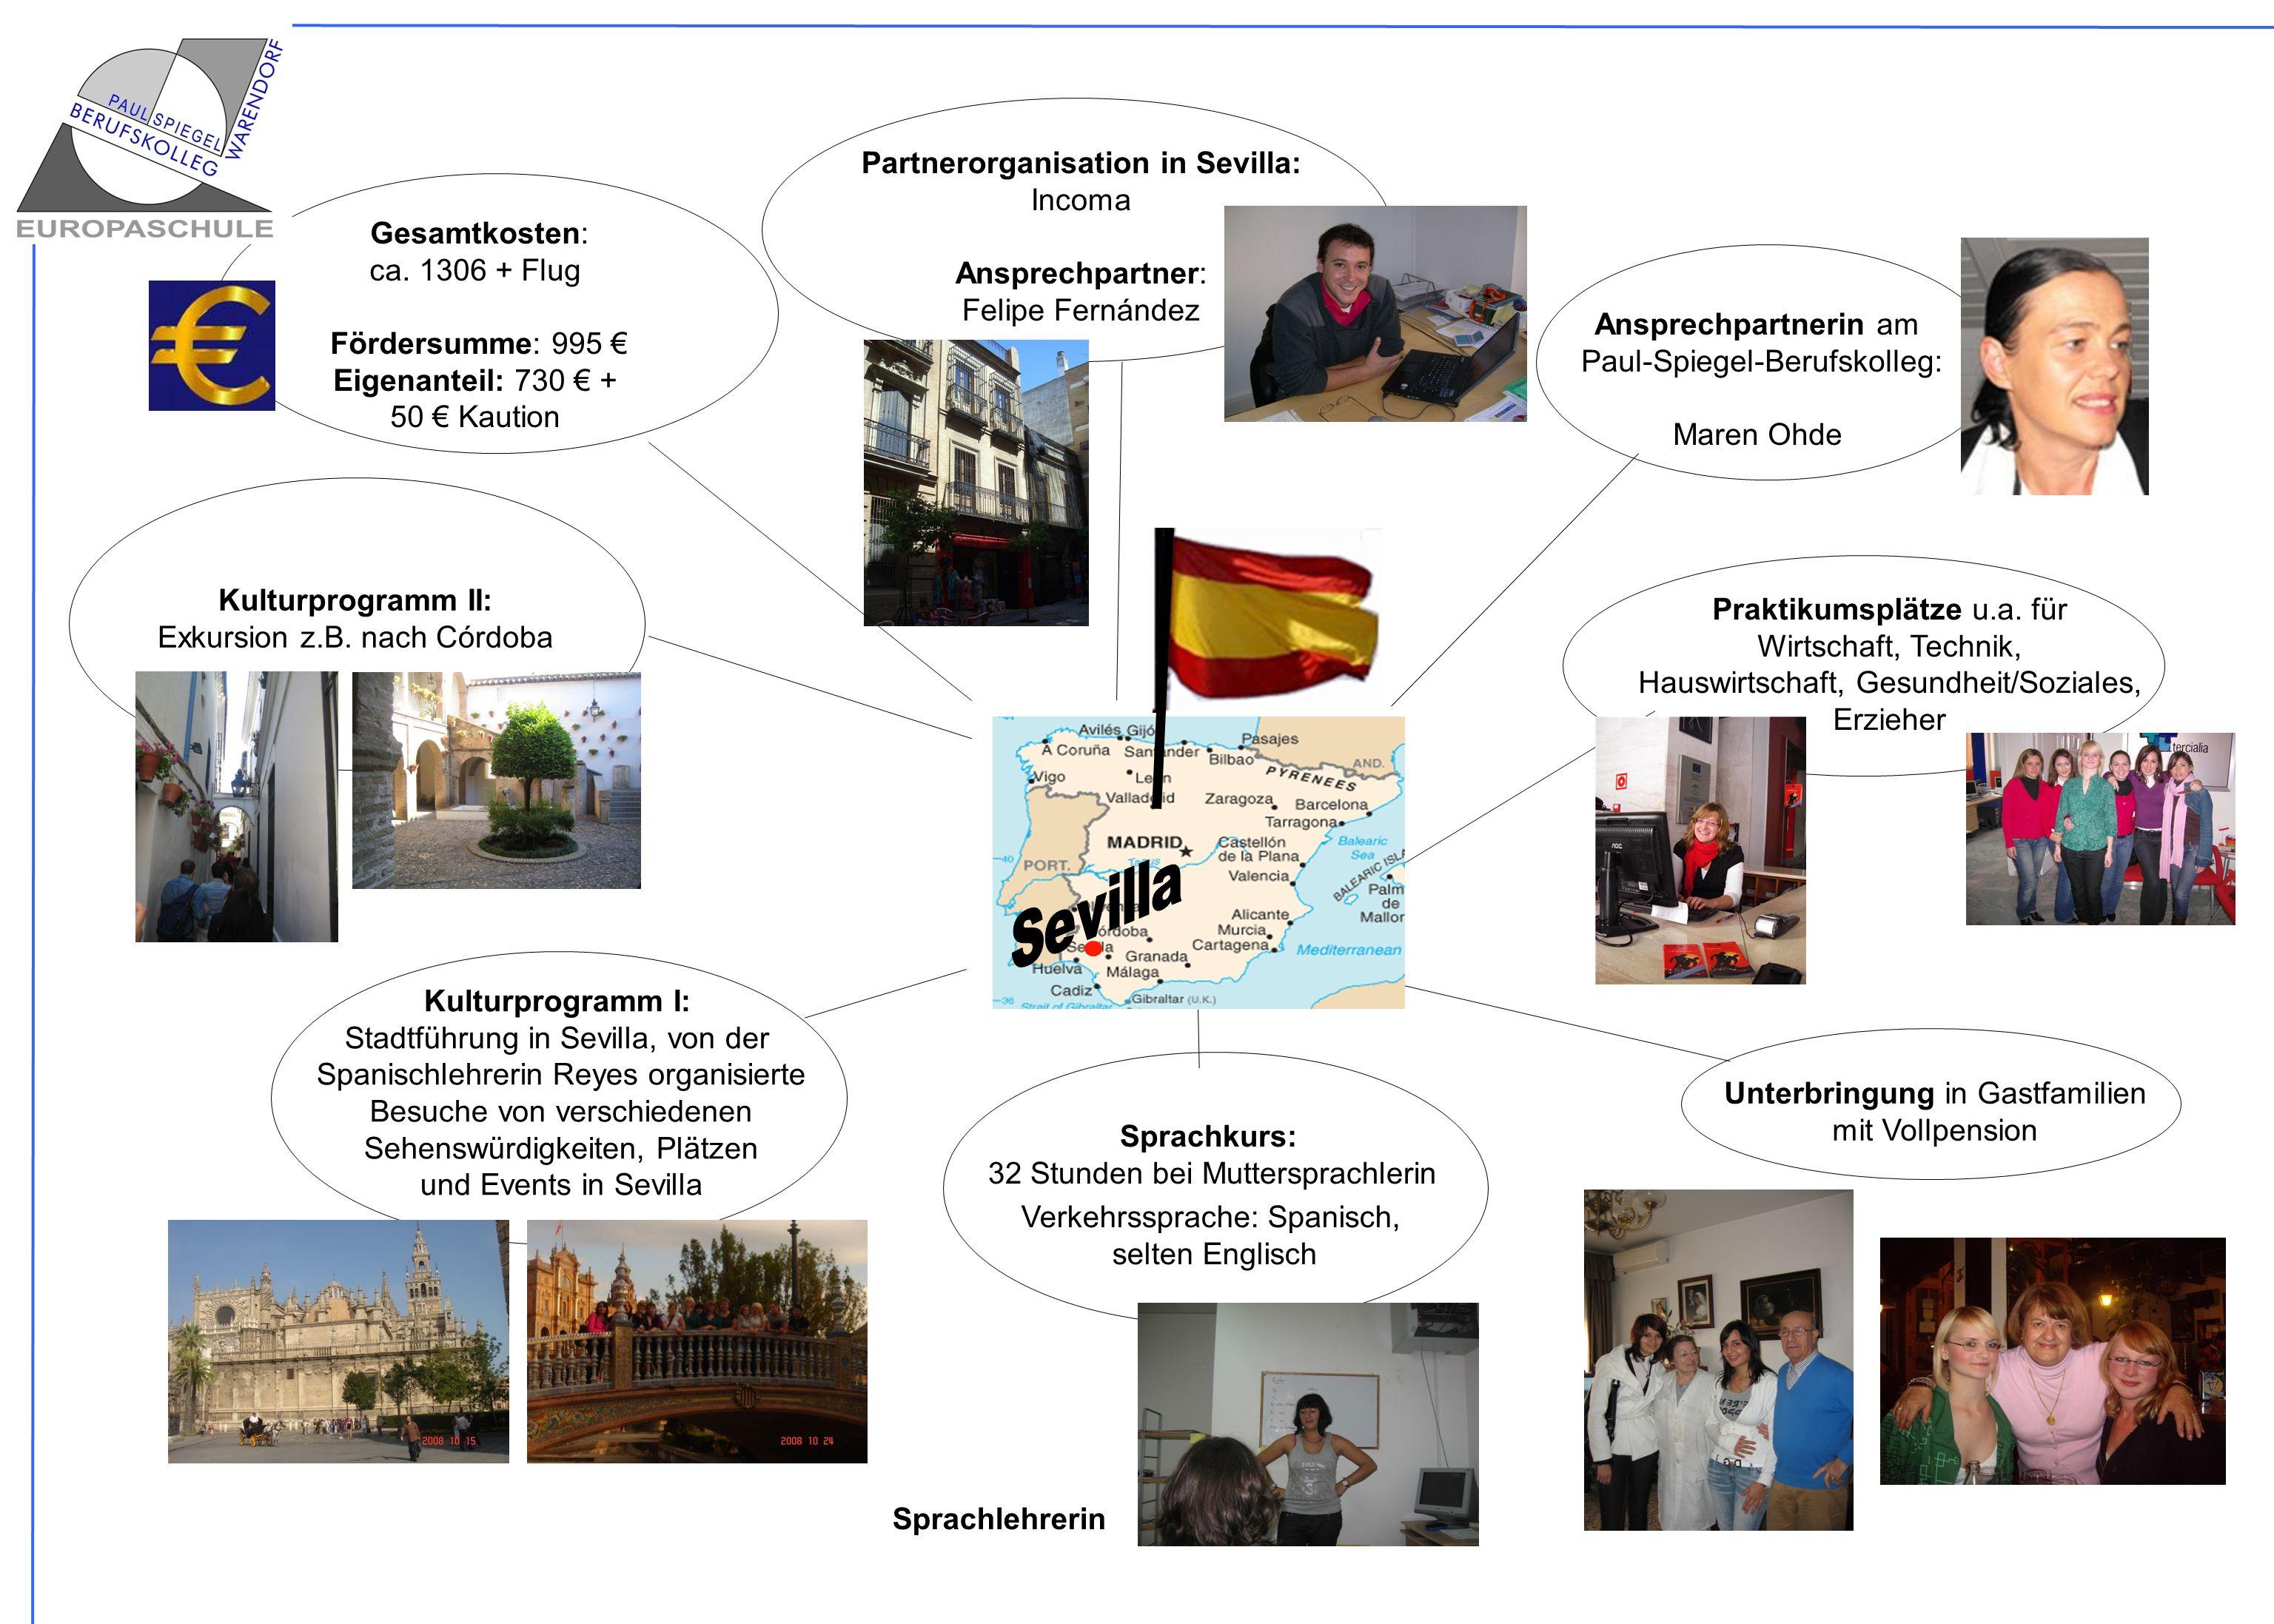 Partnerorganisation in Sevilla: Incoma Ansprechpartner: Felipe Fernández Ansprechpartnerin am Paul-Spiegel-Berufskolleg: Maren Ohde Praktikumsplätze u